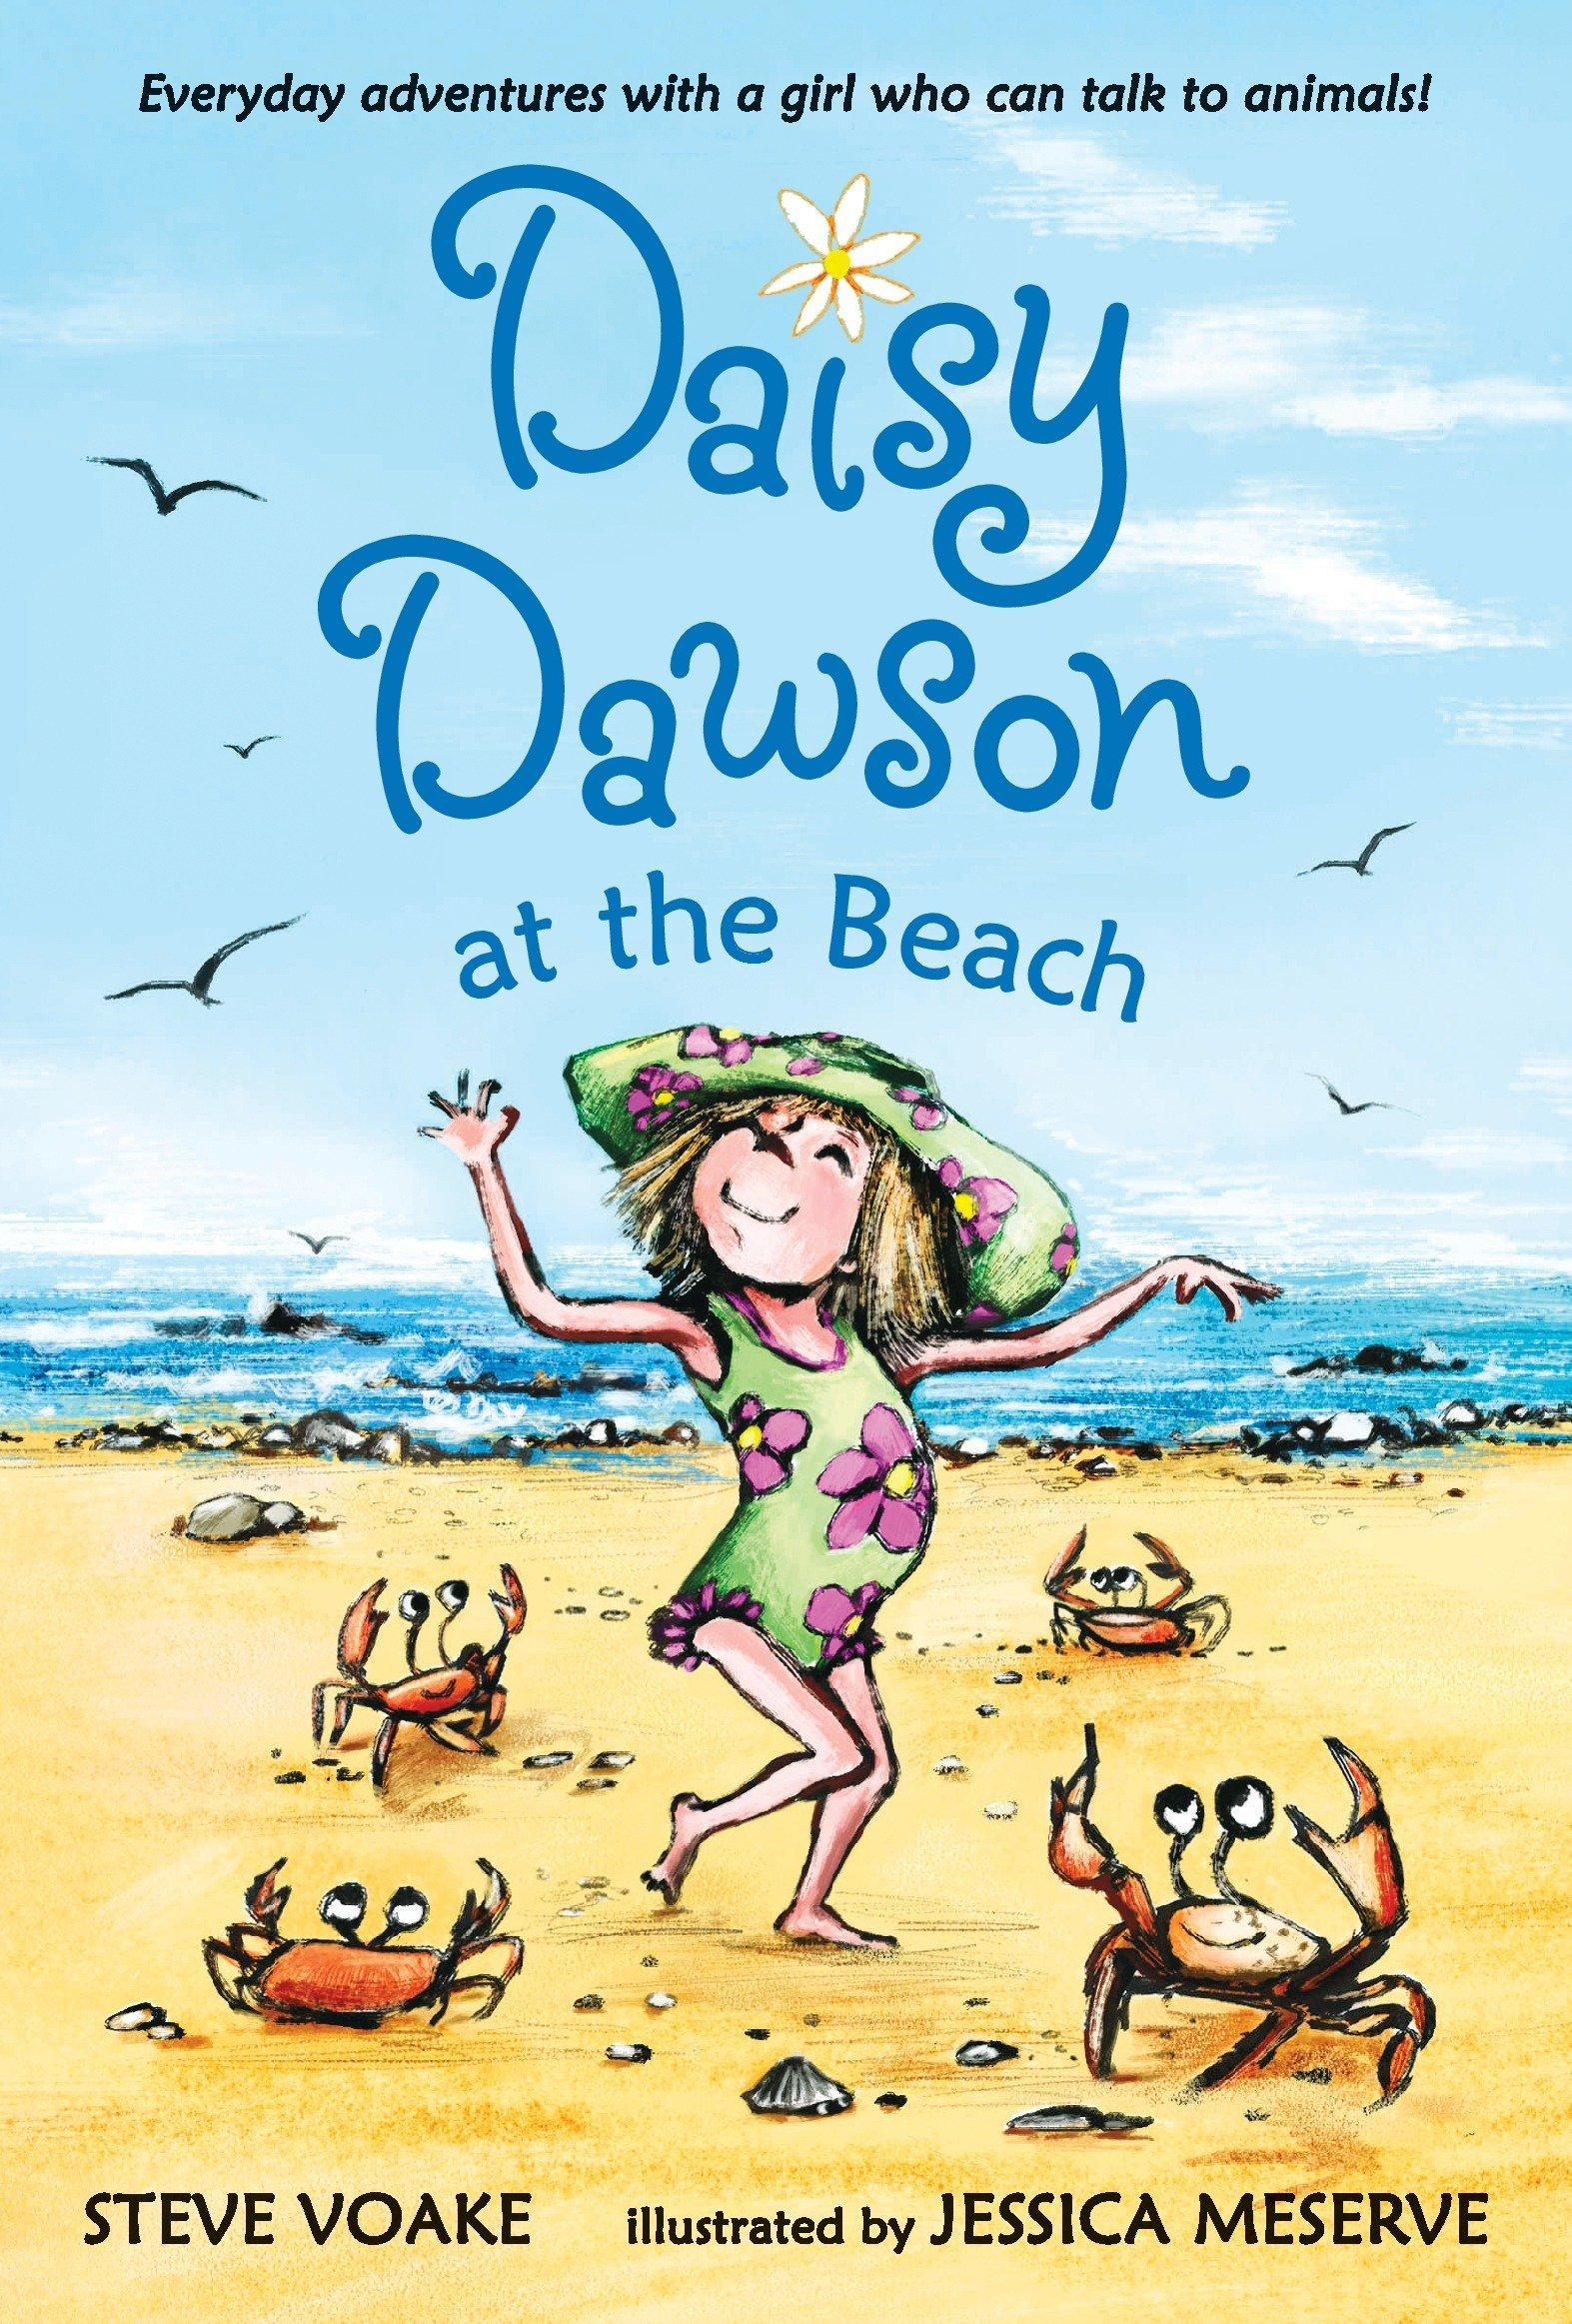 Amazon.com: Daisy Dawson at the Beach (9780763659462): Steve Voake, Jessica  Meserve: Books